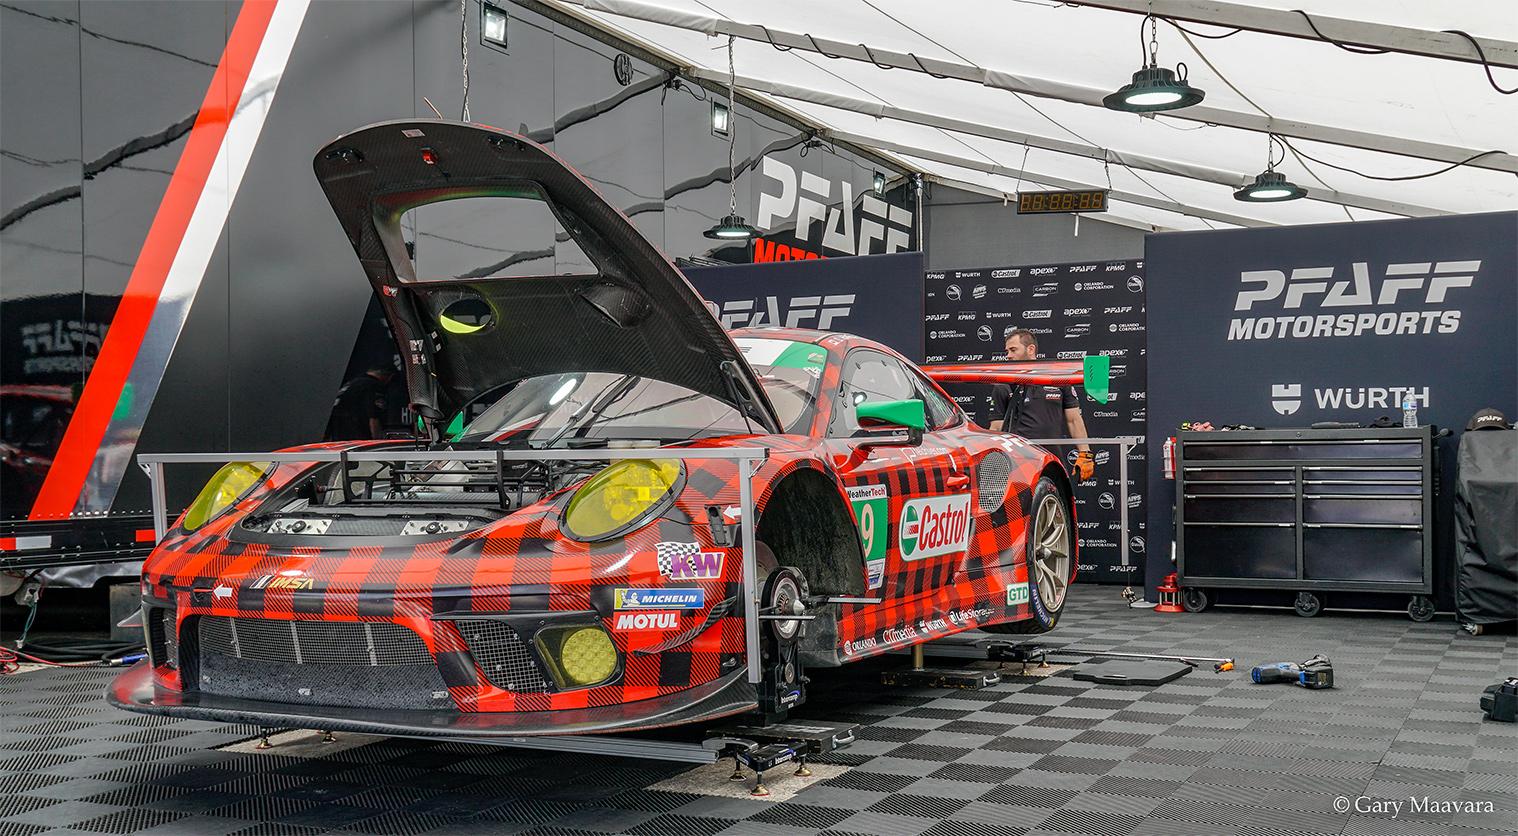 TrackWorthy - WT paddock_Pfaff Porsche_plaid one